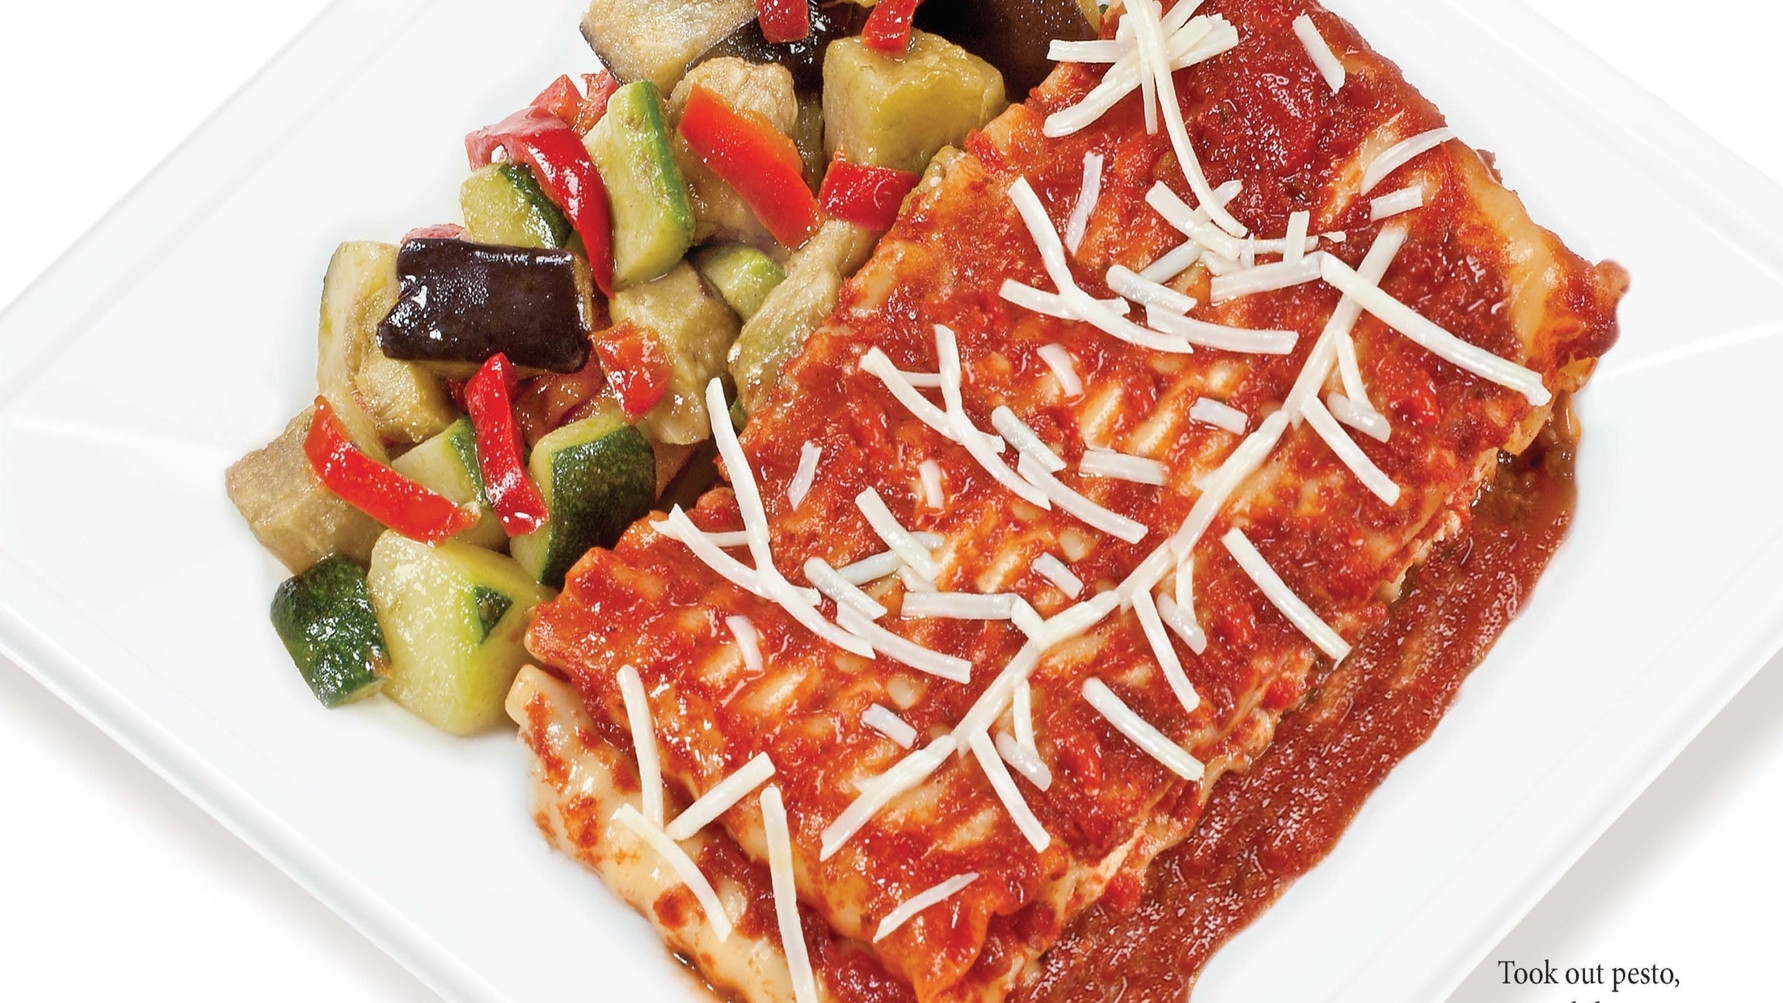 No Pesto Replace Meatsauce with Tomato Sauce